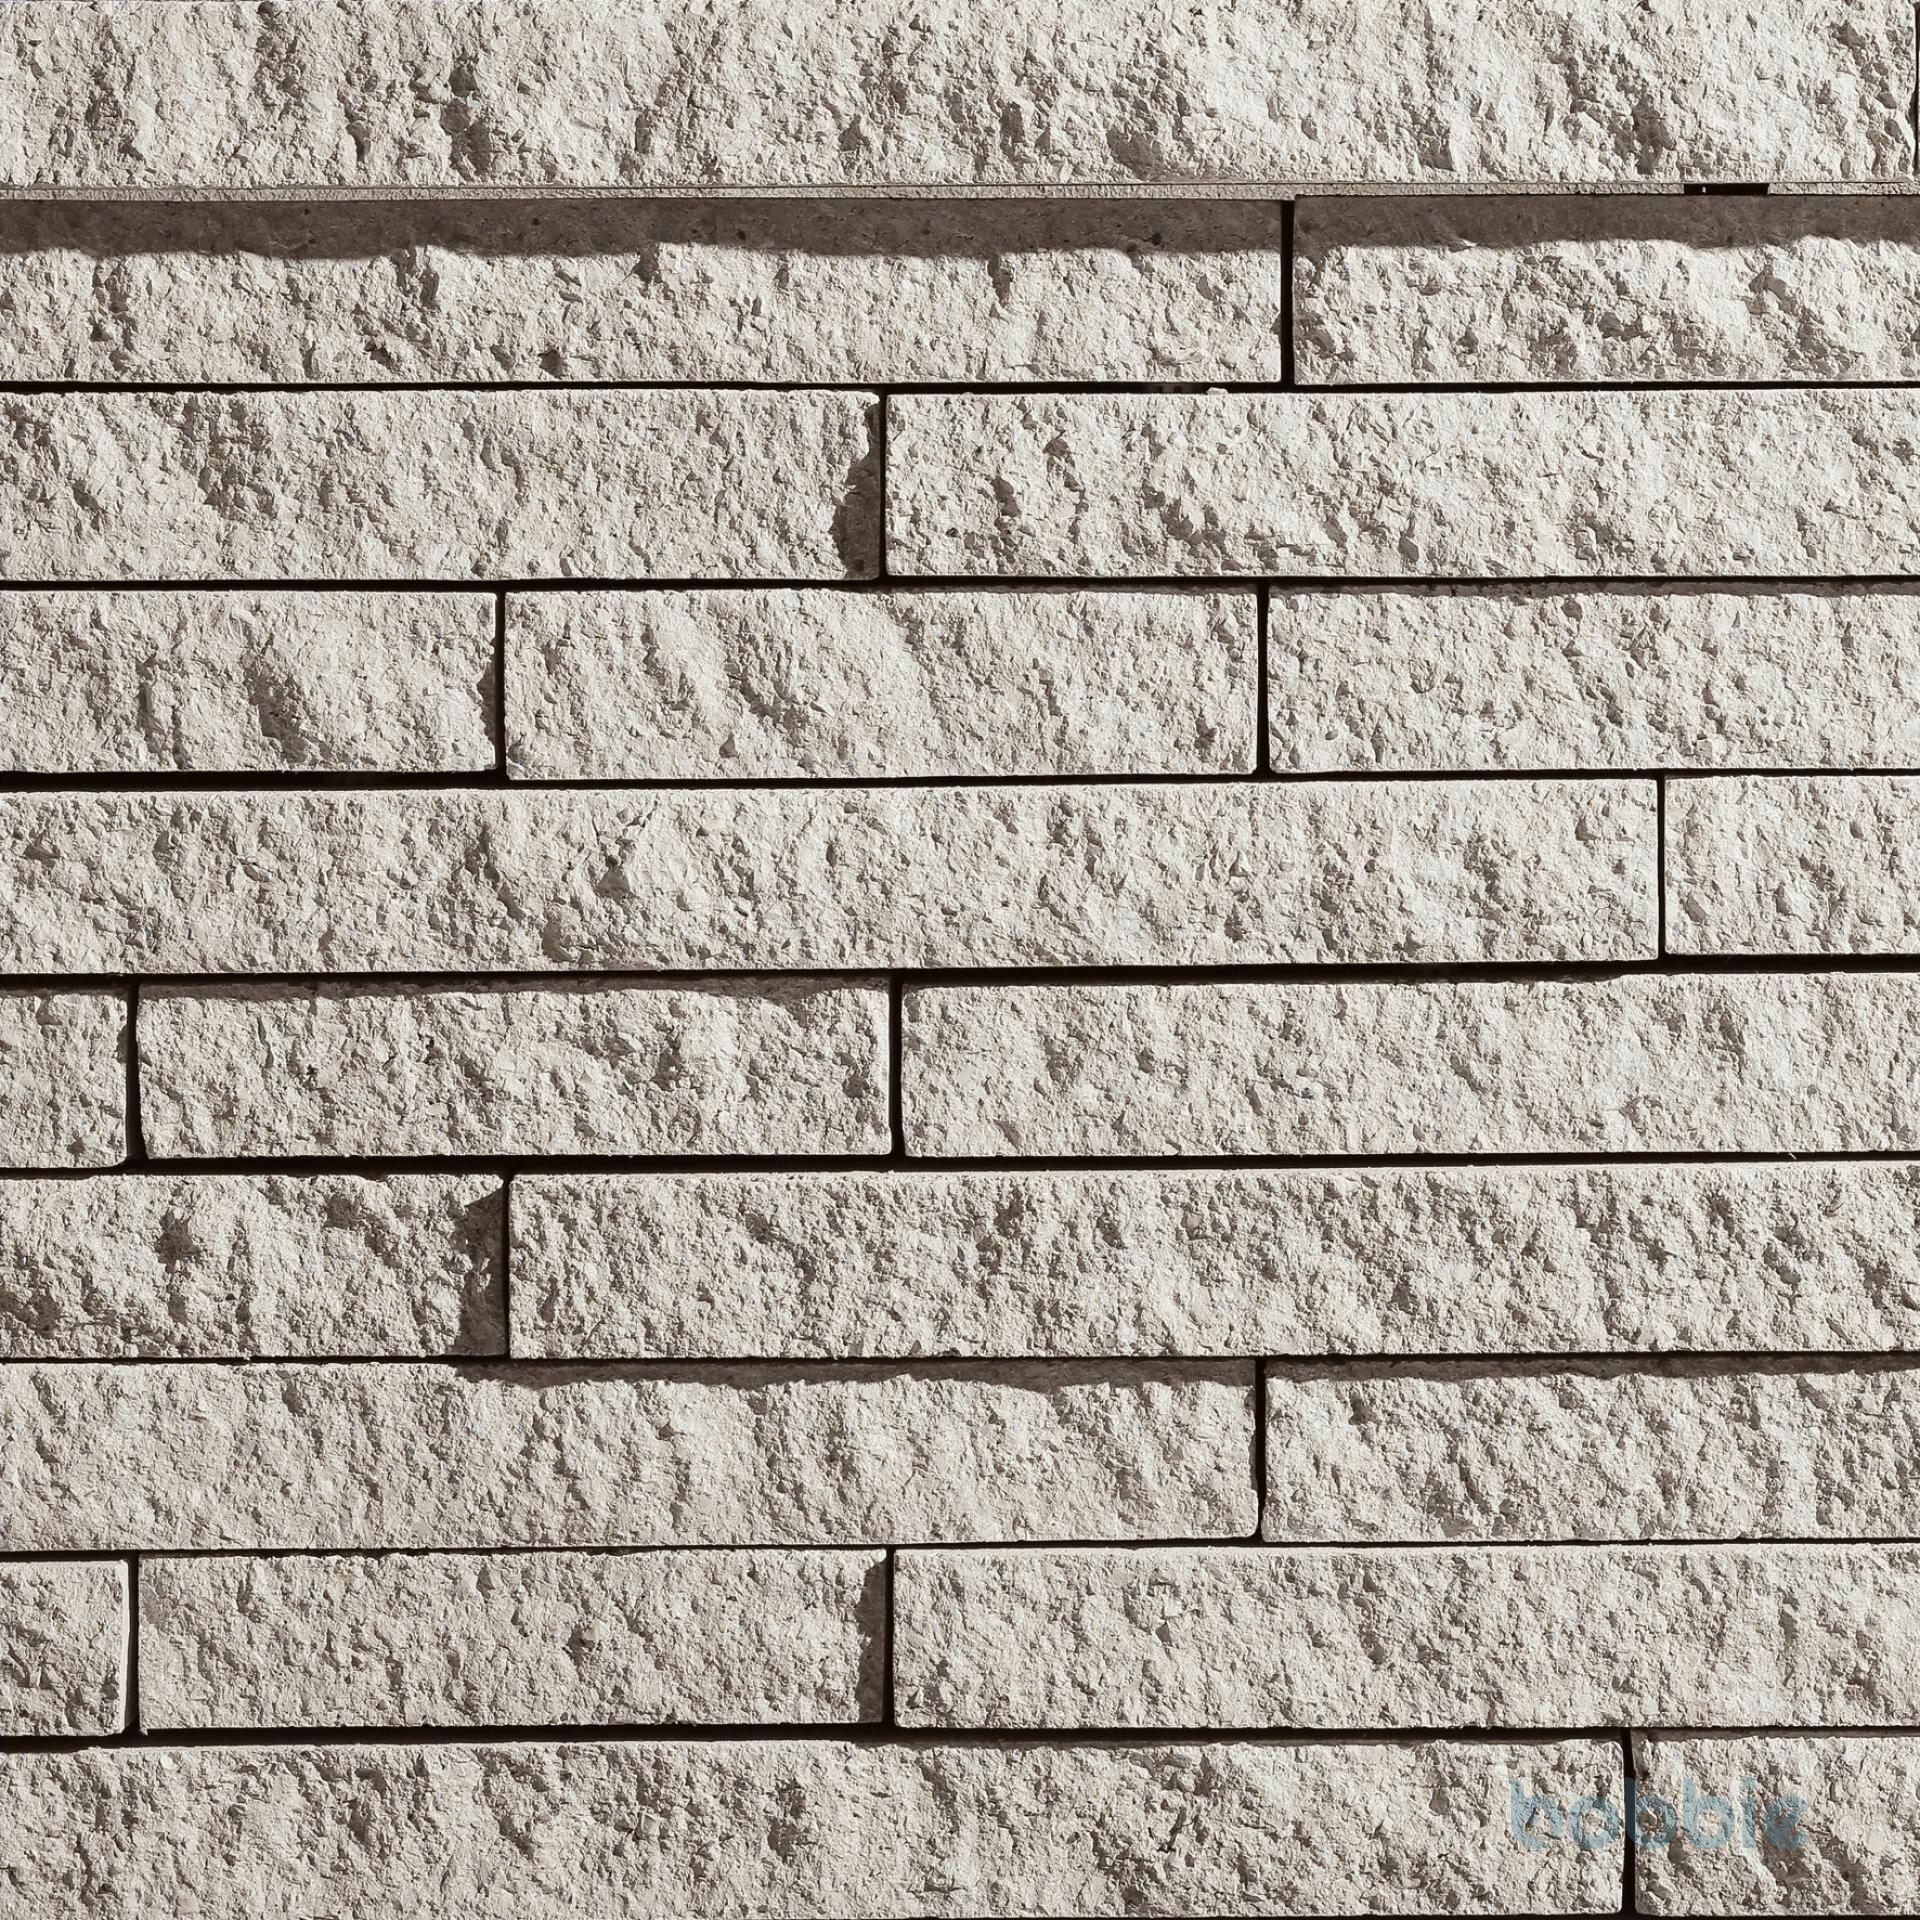 Mauern, CULT® LONG-LINE® NAMENSSTEINE, 450x350x75, Platingrau II